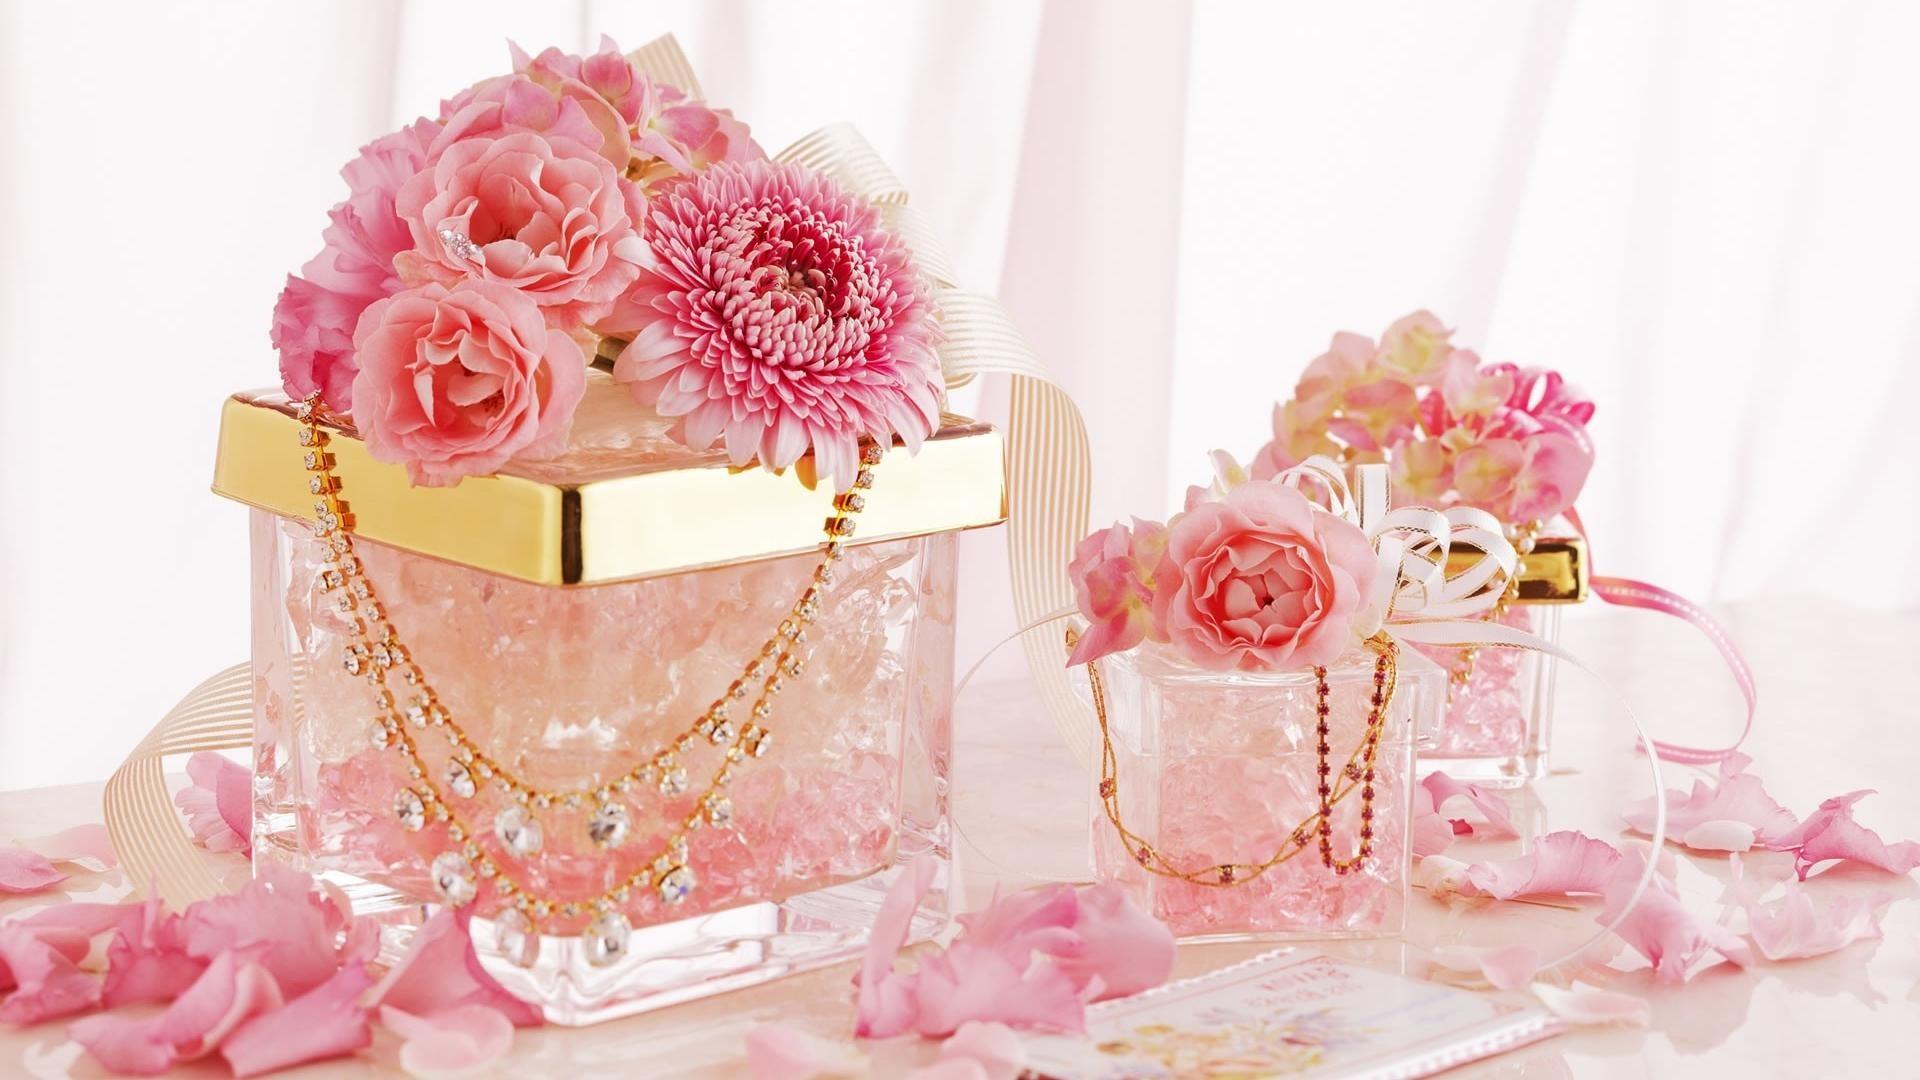 Res: 1920x1080, Fotografie - Stillleben Glas Pink Flower Petal Gold Diamond Schmuck  Chrysanthemen Rose Blume Wallpaper